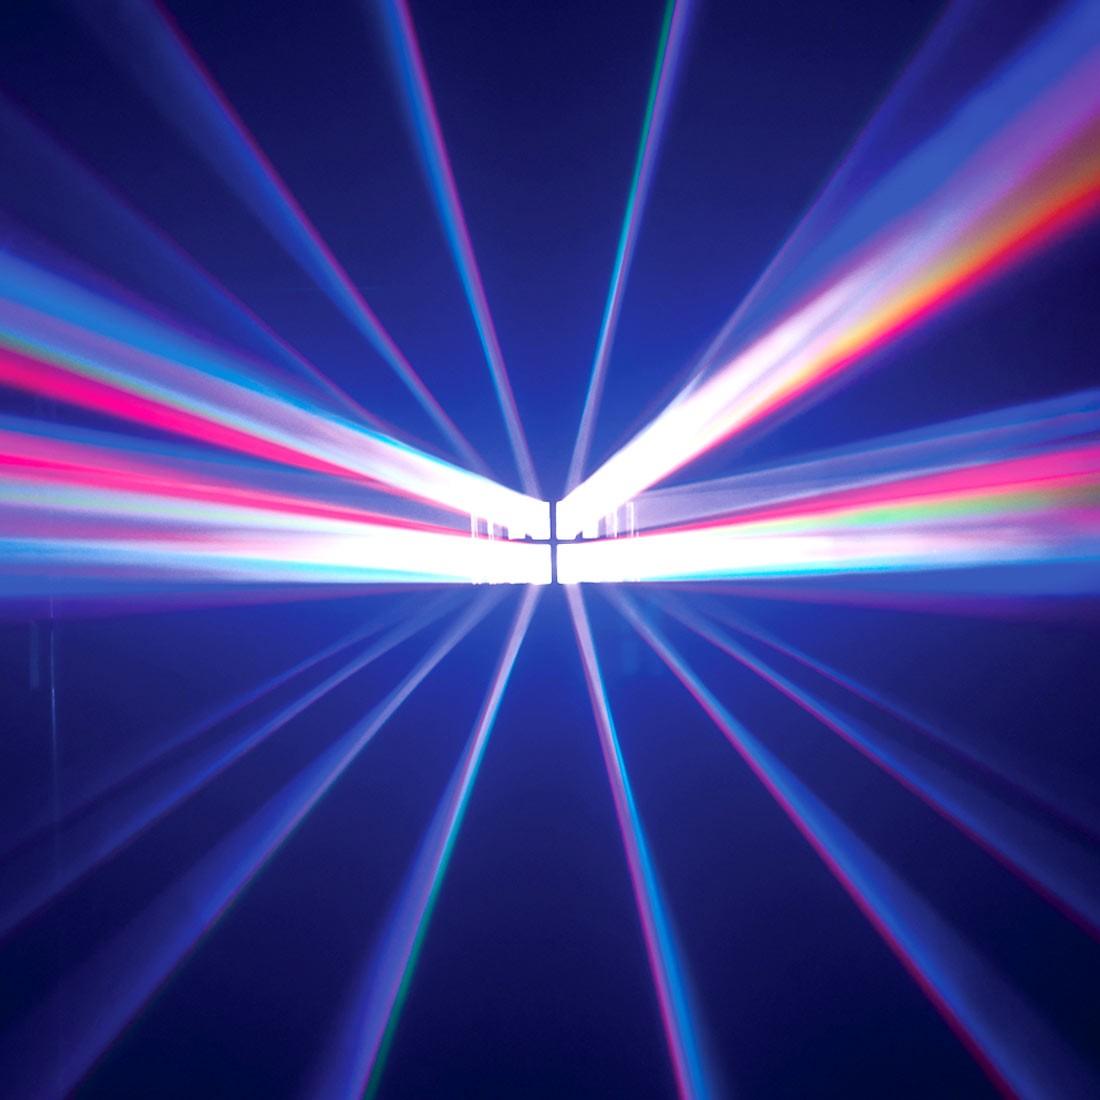 ADJ | Agressor TRI LED | Klassiker unter den LED Effekten